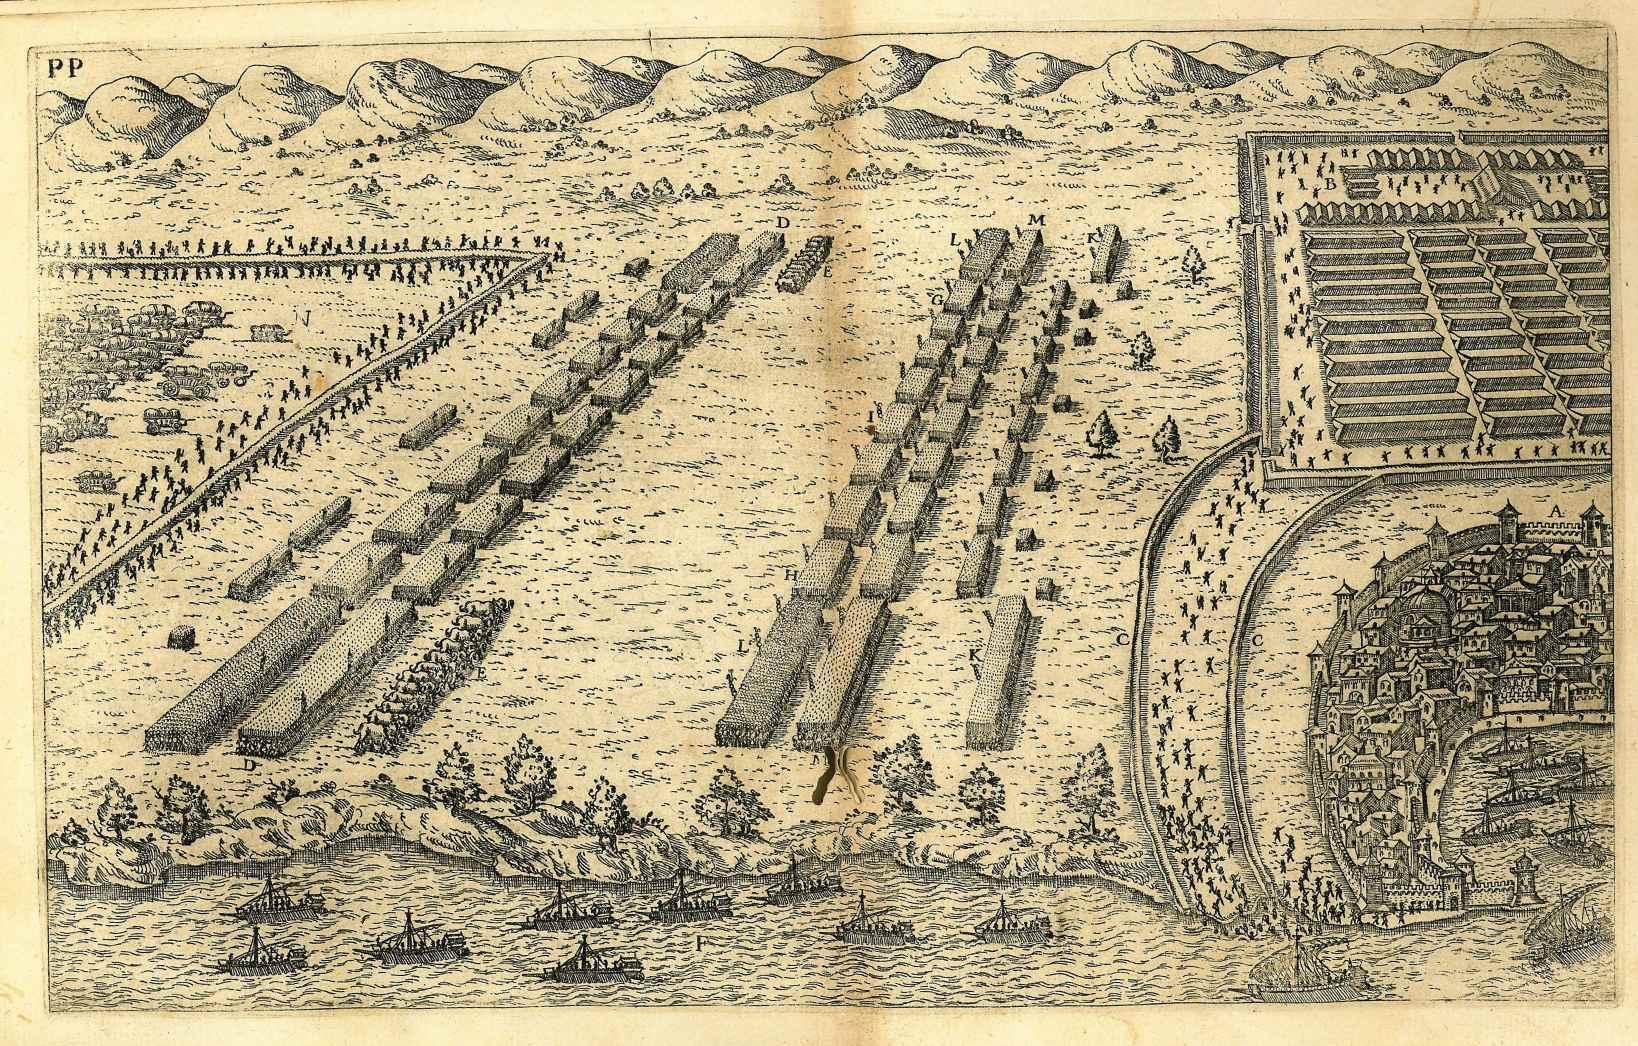 Ancient Roman Wars: The Battle of Pharsalus 48 B.C.